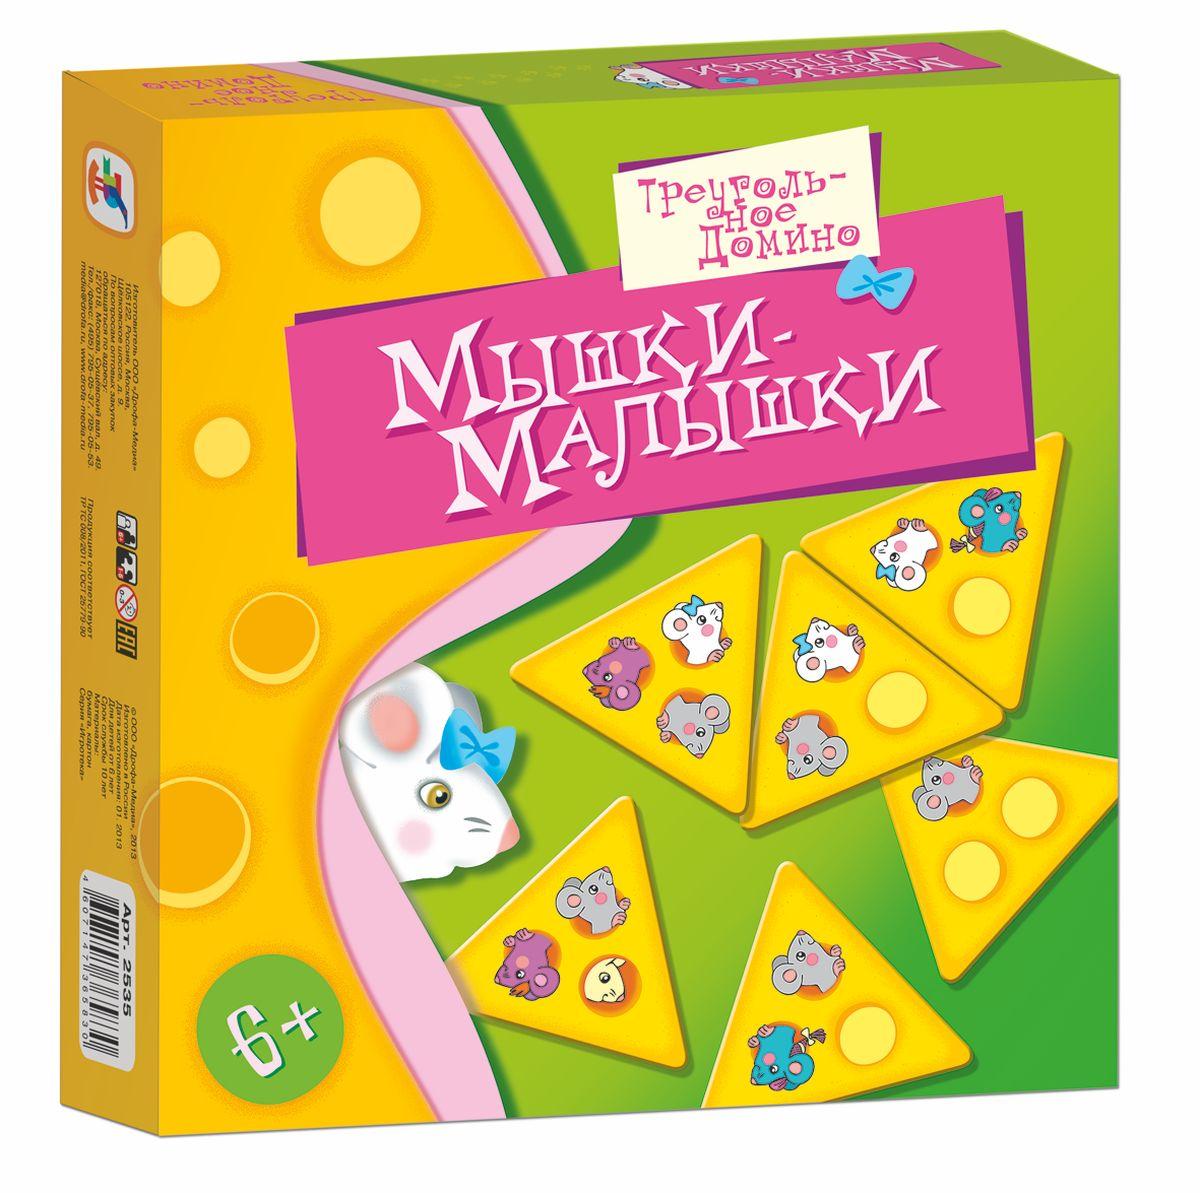 Дрофа-Медиа Обучающая игра Мышки-малышки